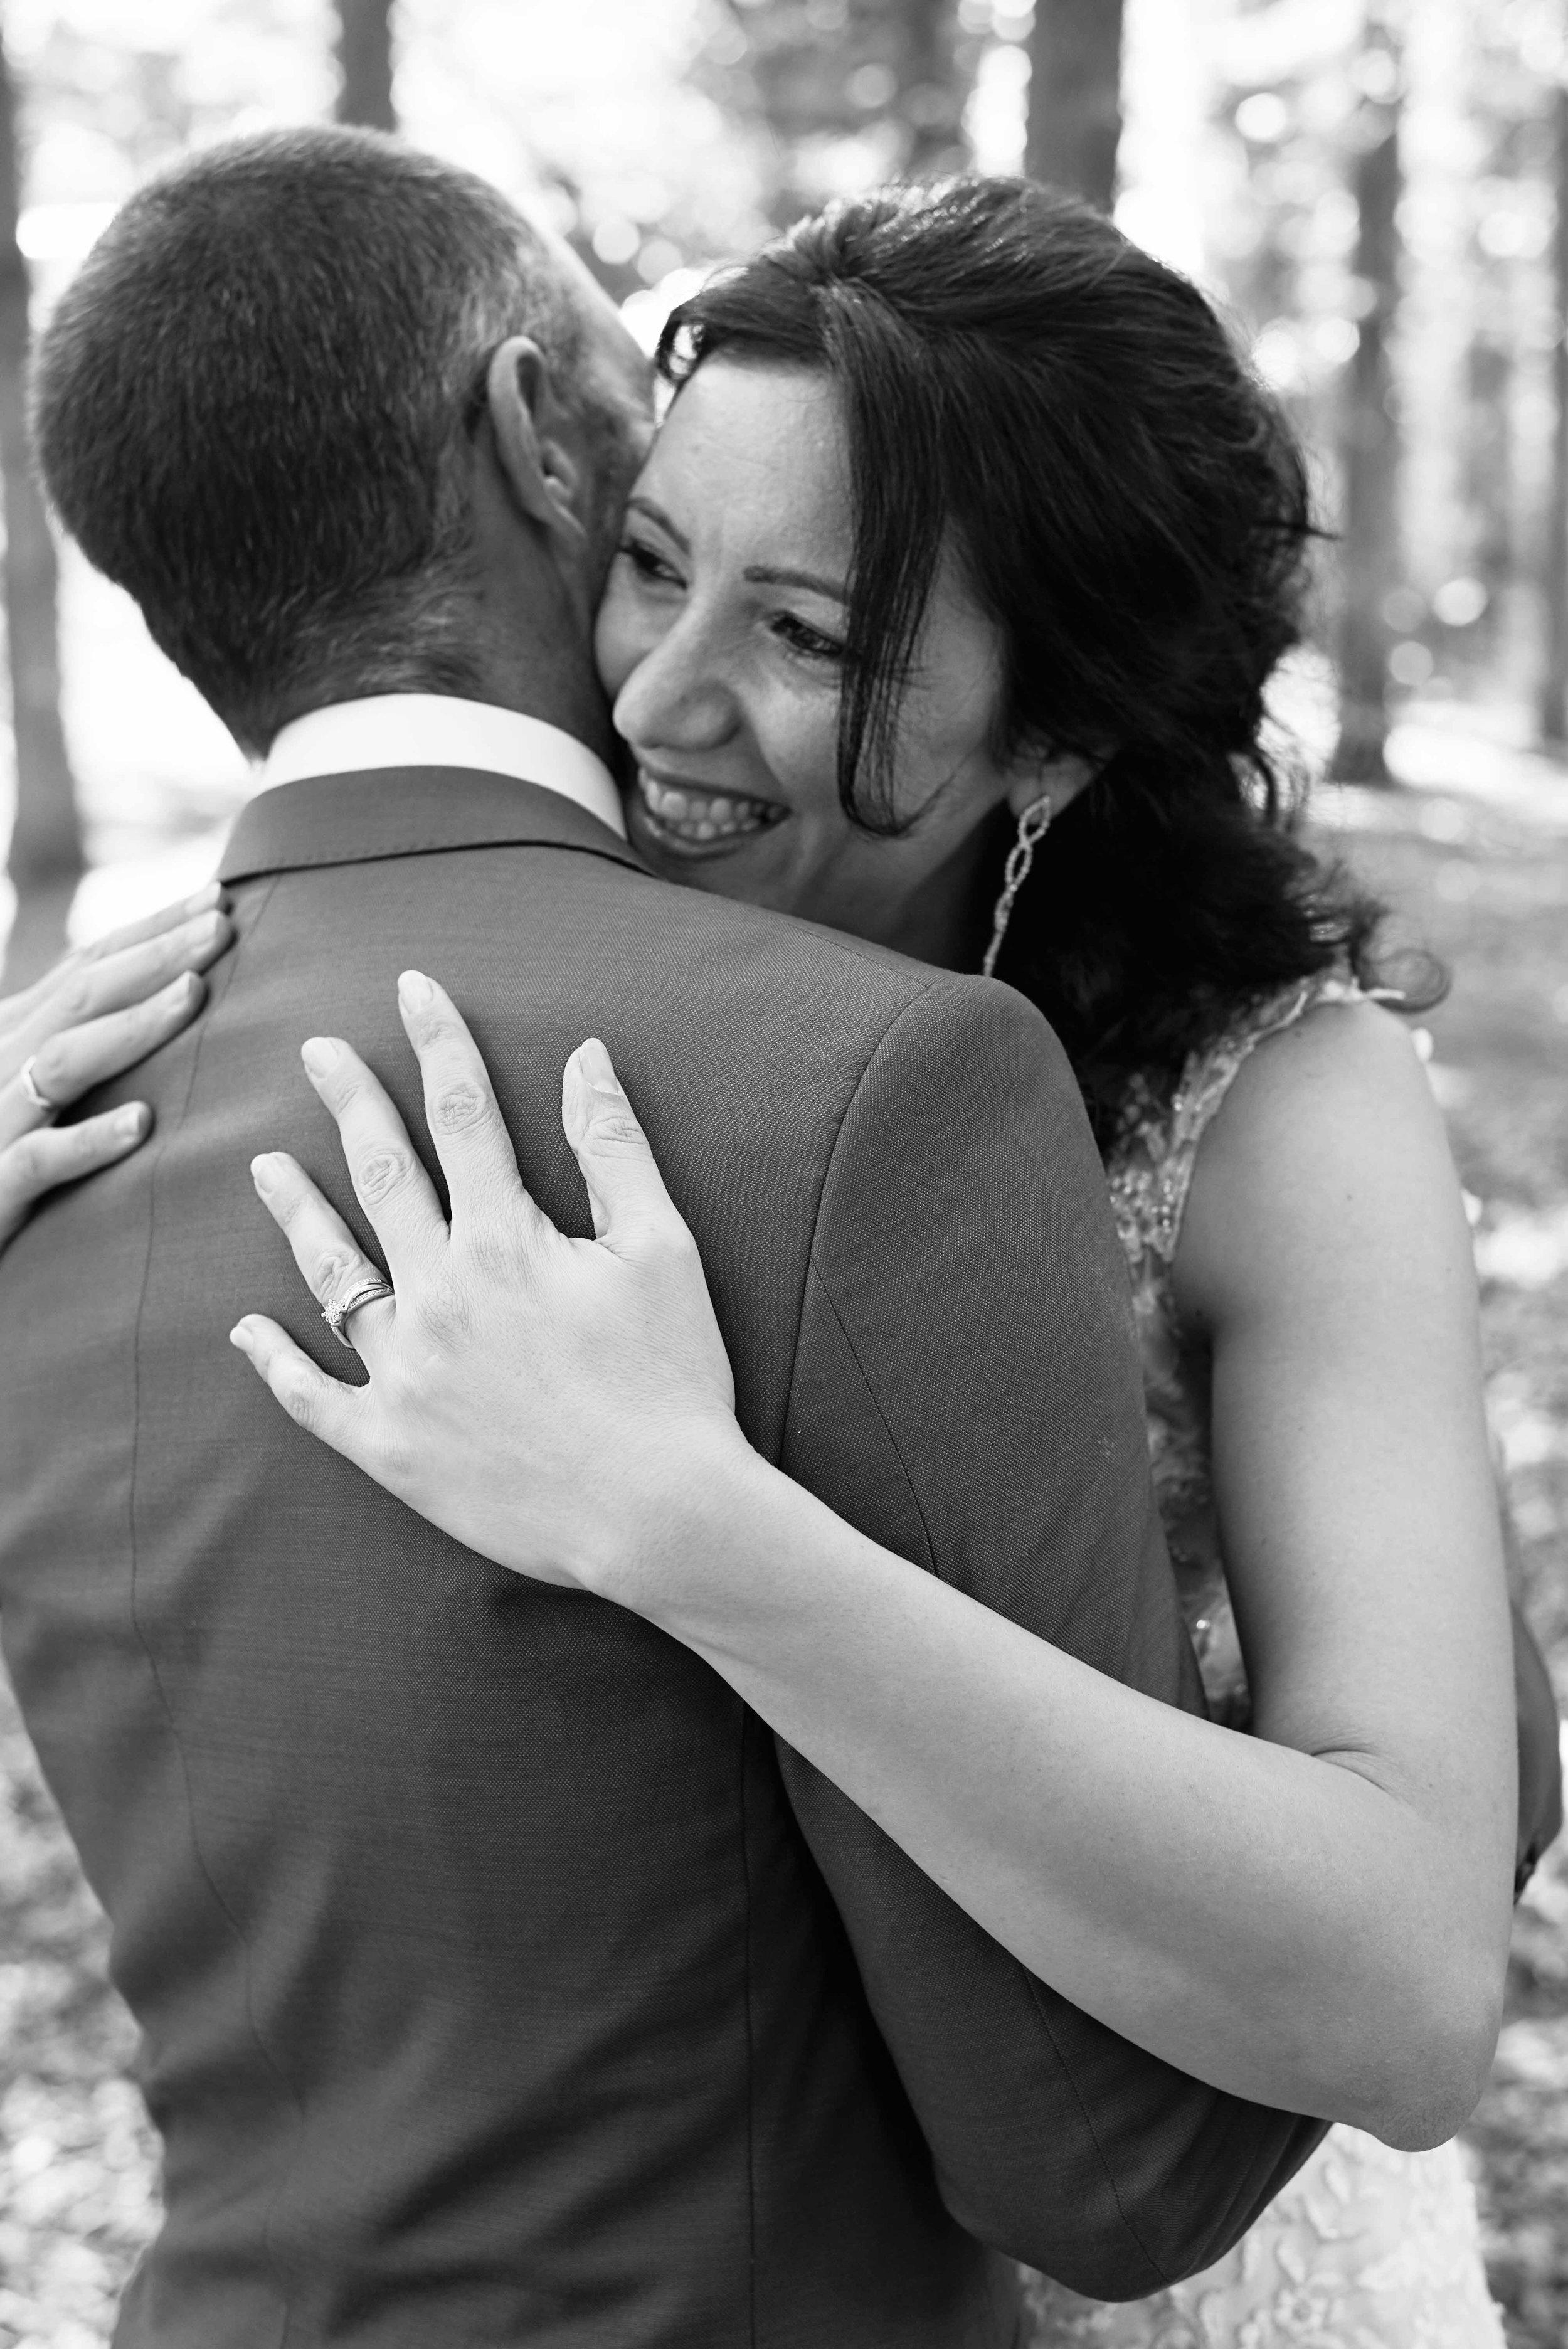 sorrento-wedding-photography-all-smiles-marissa-jade-photography-145.jpg